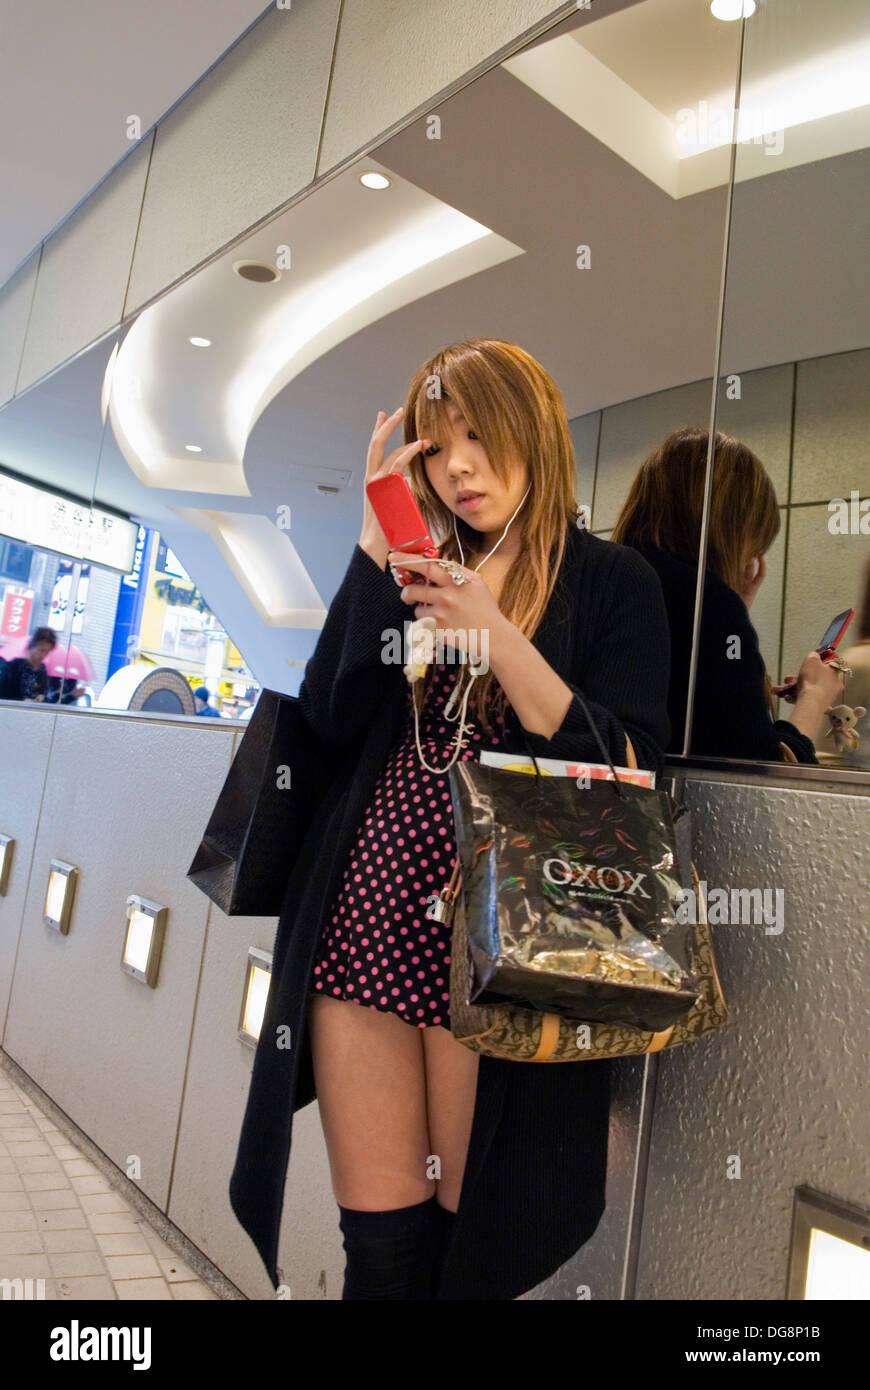 young fashion victim at department store 109 in Shibuya,Tokyo,Japan - Stock Image